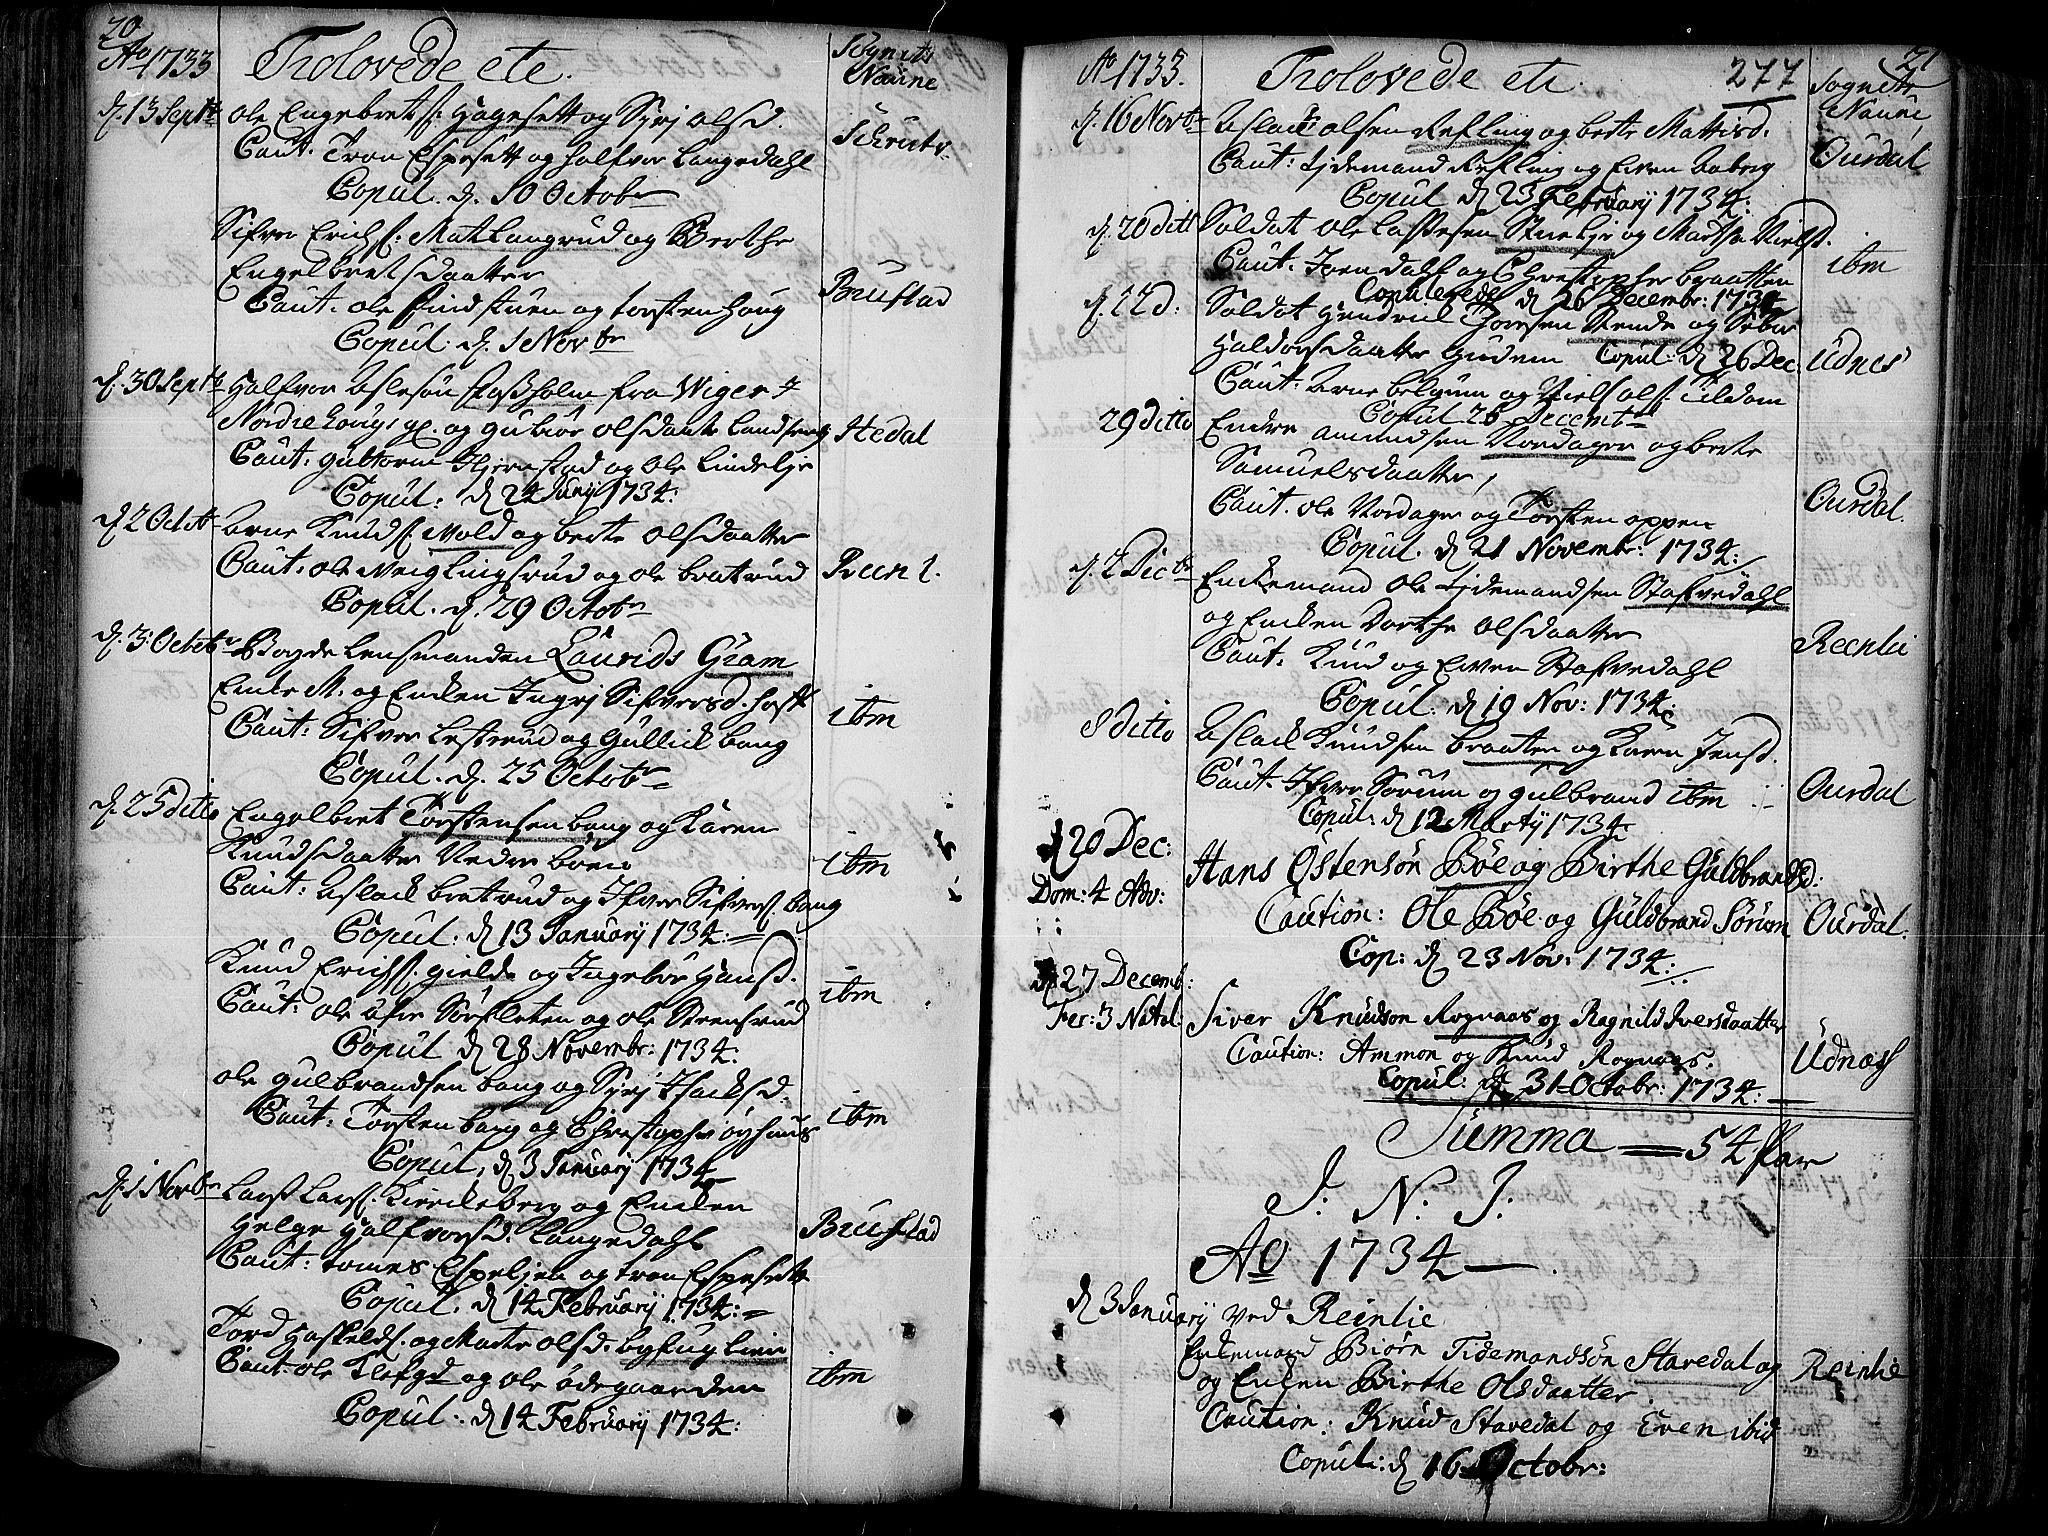 SAH, Aurdal prestekontor, Ministerialbok nr. 4, 1730-1762, s. 20-21